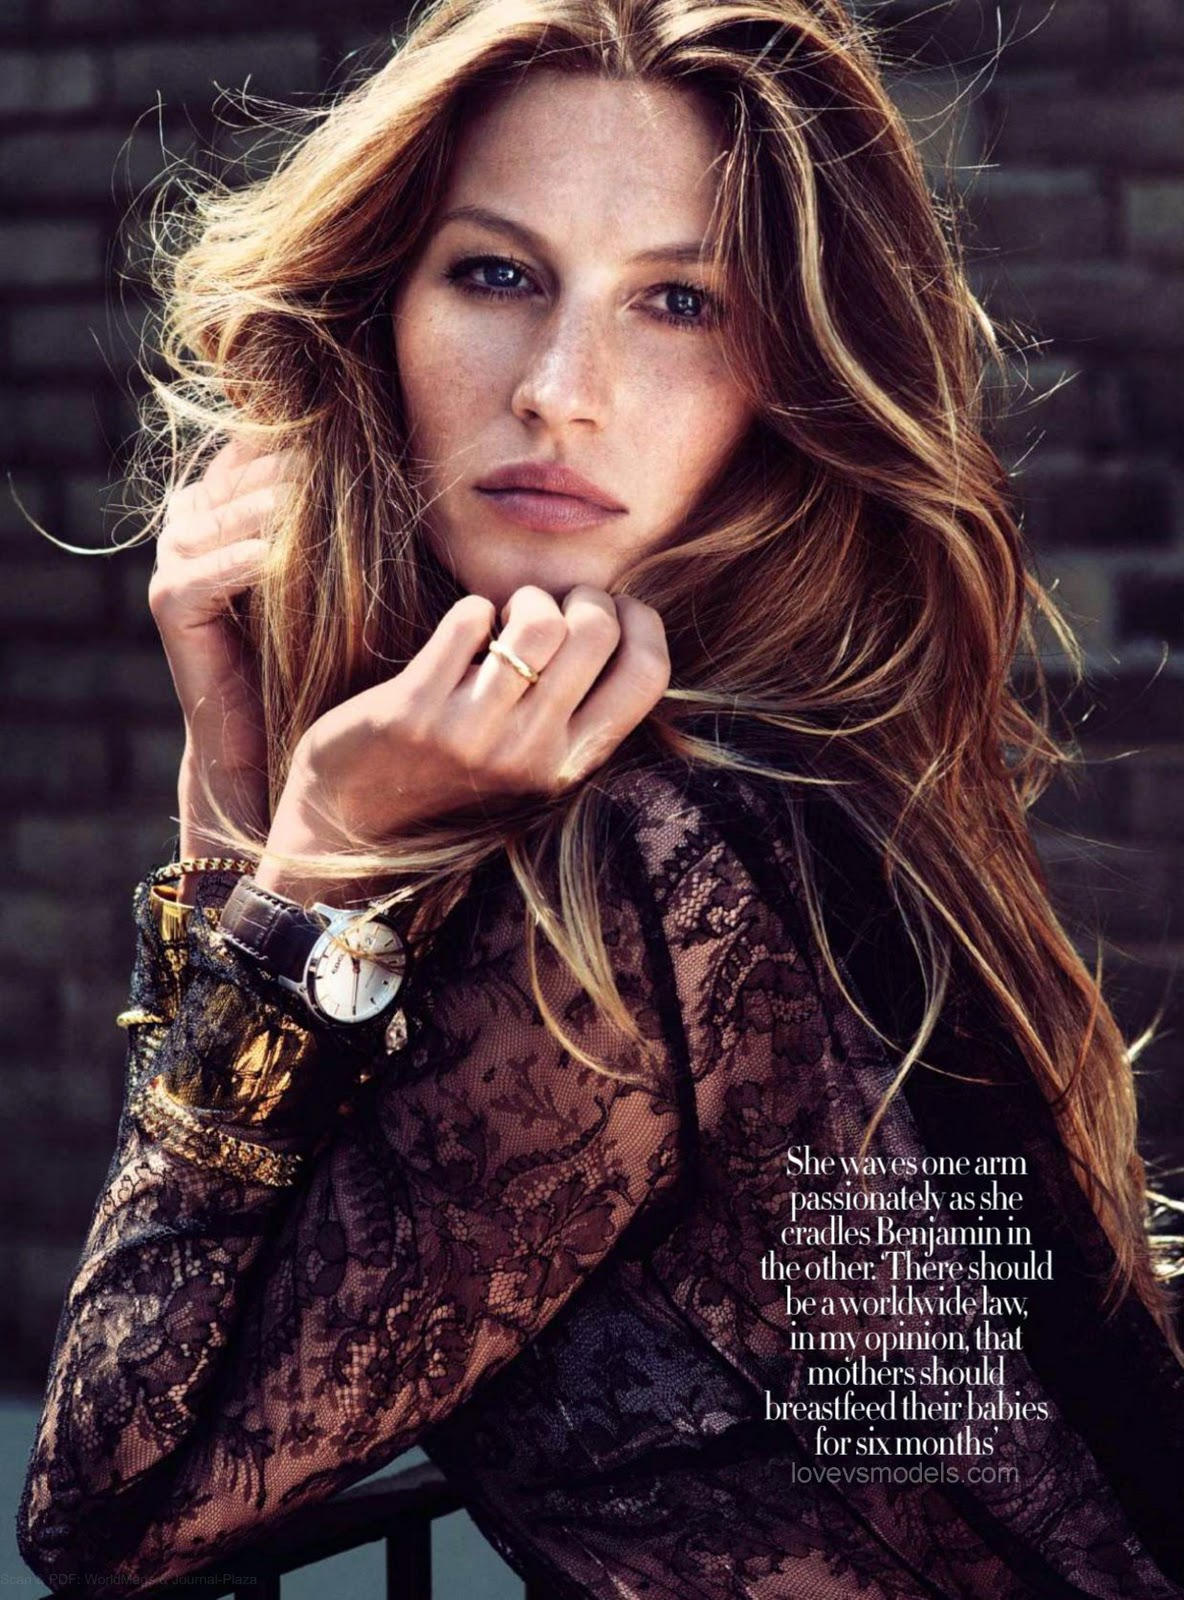 Gisele Bündchen (Harper's Bazaar Sep 2010) HQ - Models Inspiration Gisele Bundchen